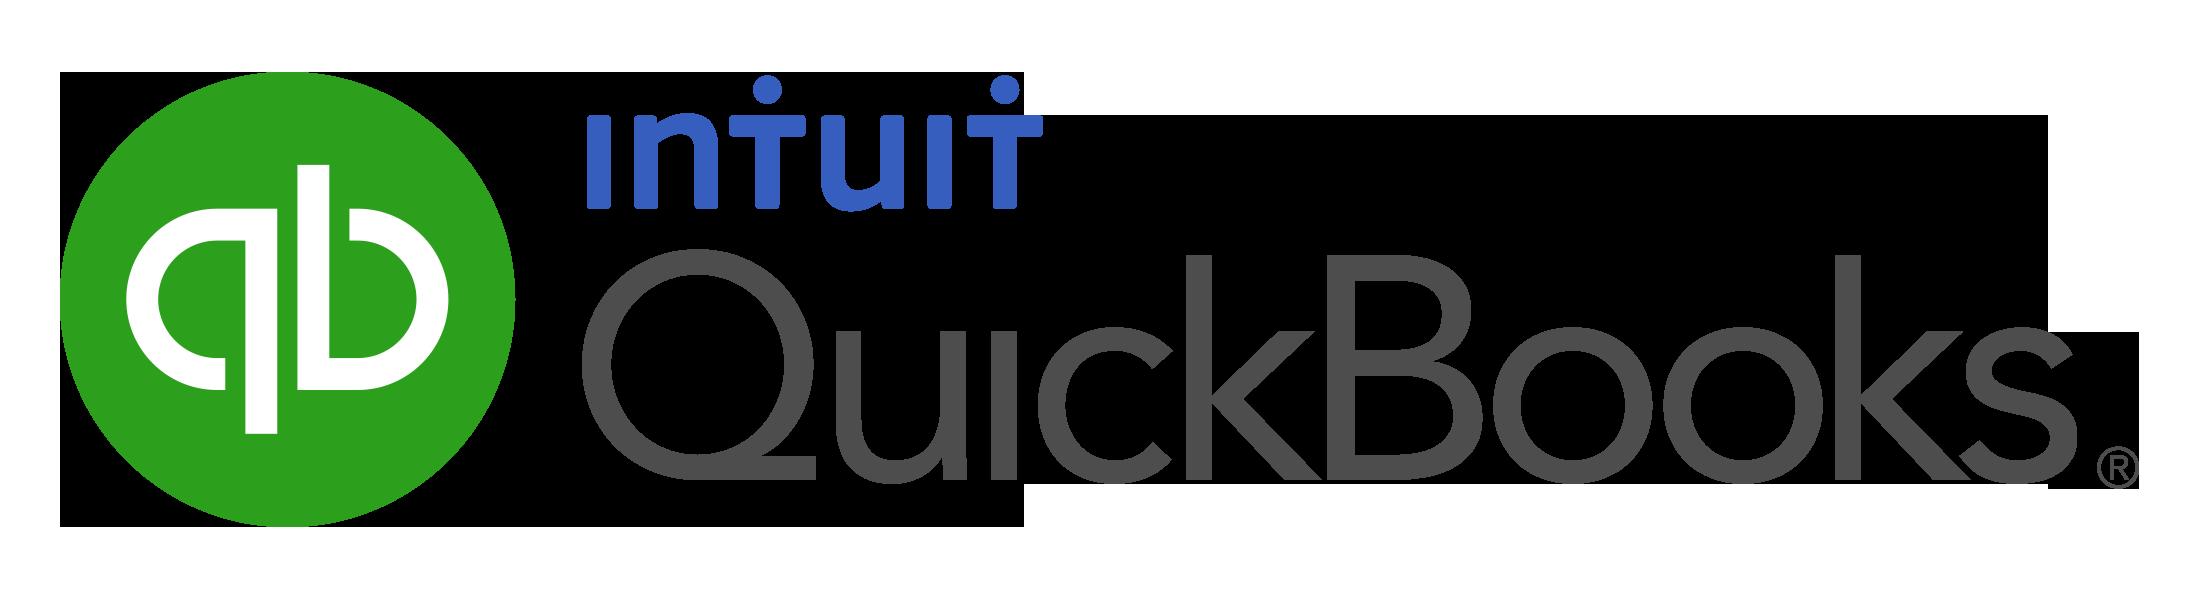 qk_intuit_logo